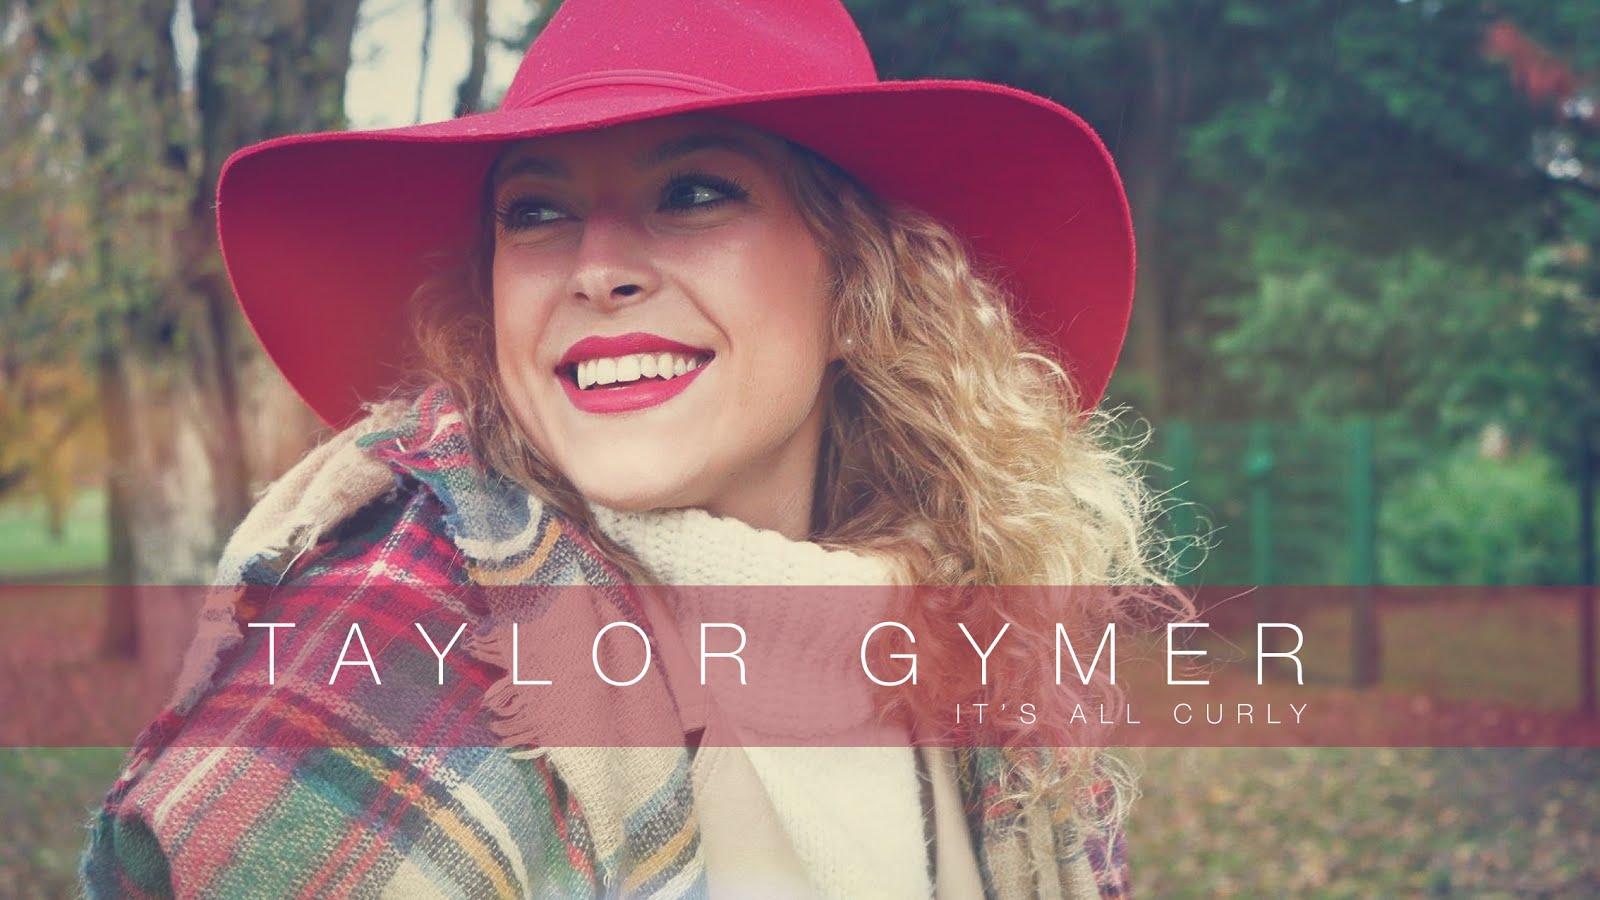 TAYLOR GYMER